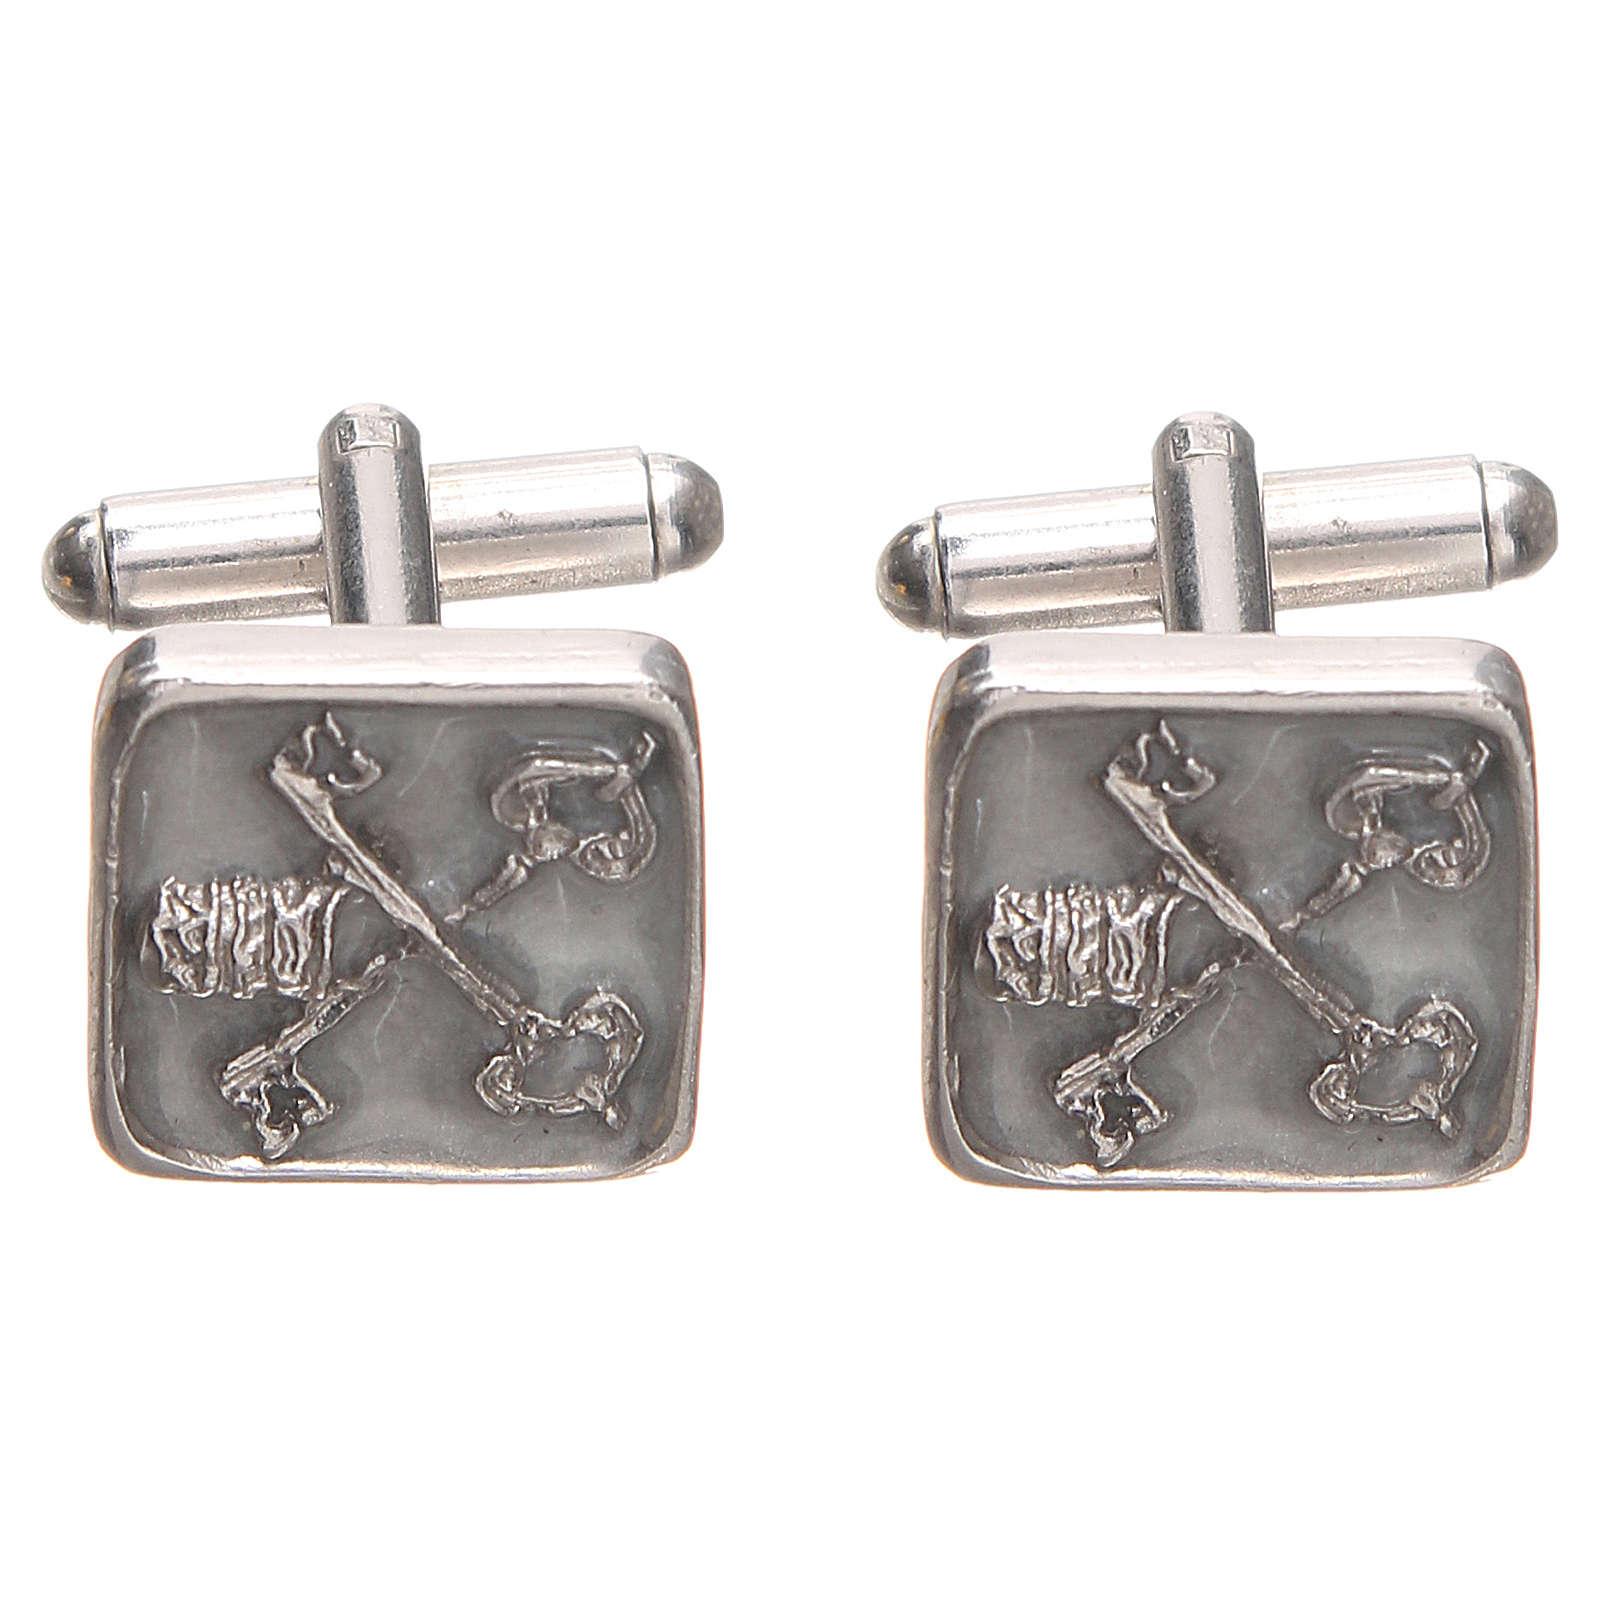 Cufflinks Silver 800 Vatican City keys 1,5x1,5cm 4